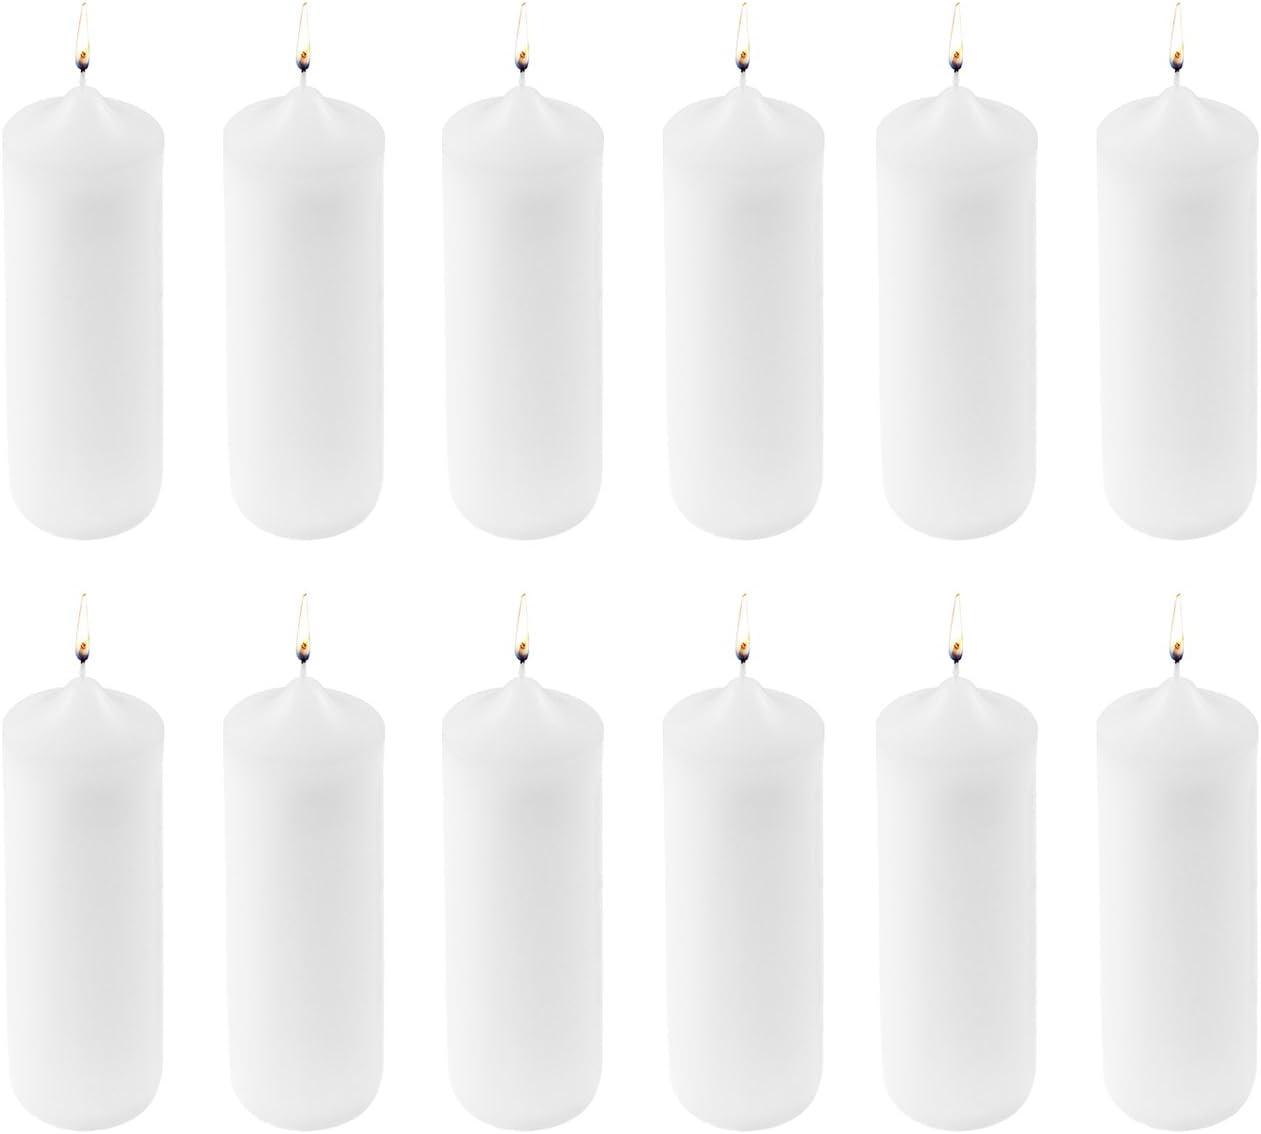 Super Z Outlet Regular store 3 x 9 for Unscented Home Sacramento Mall Candles Decoratio Pillar